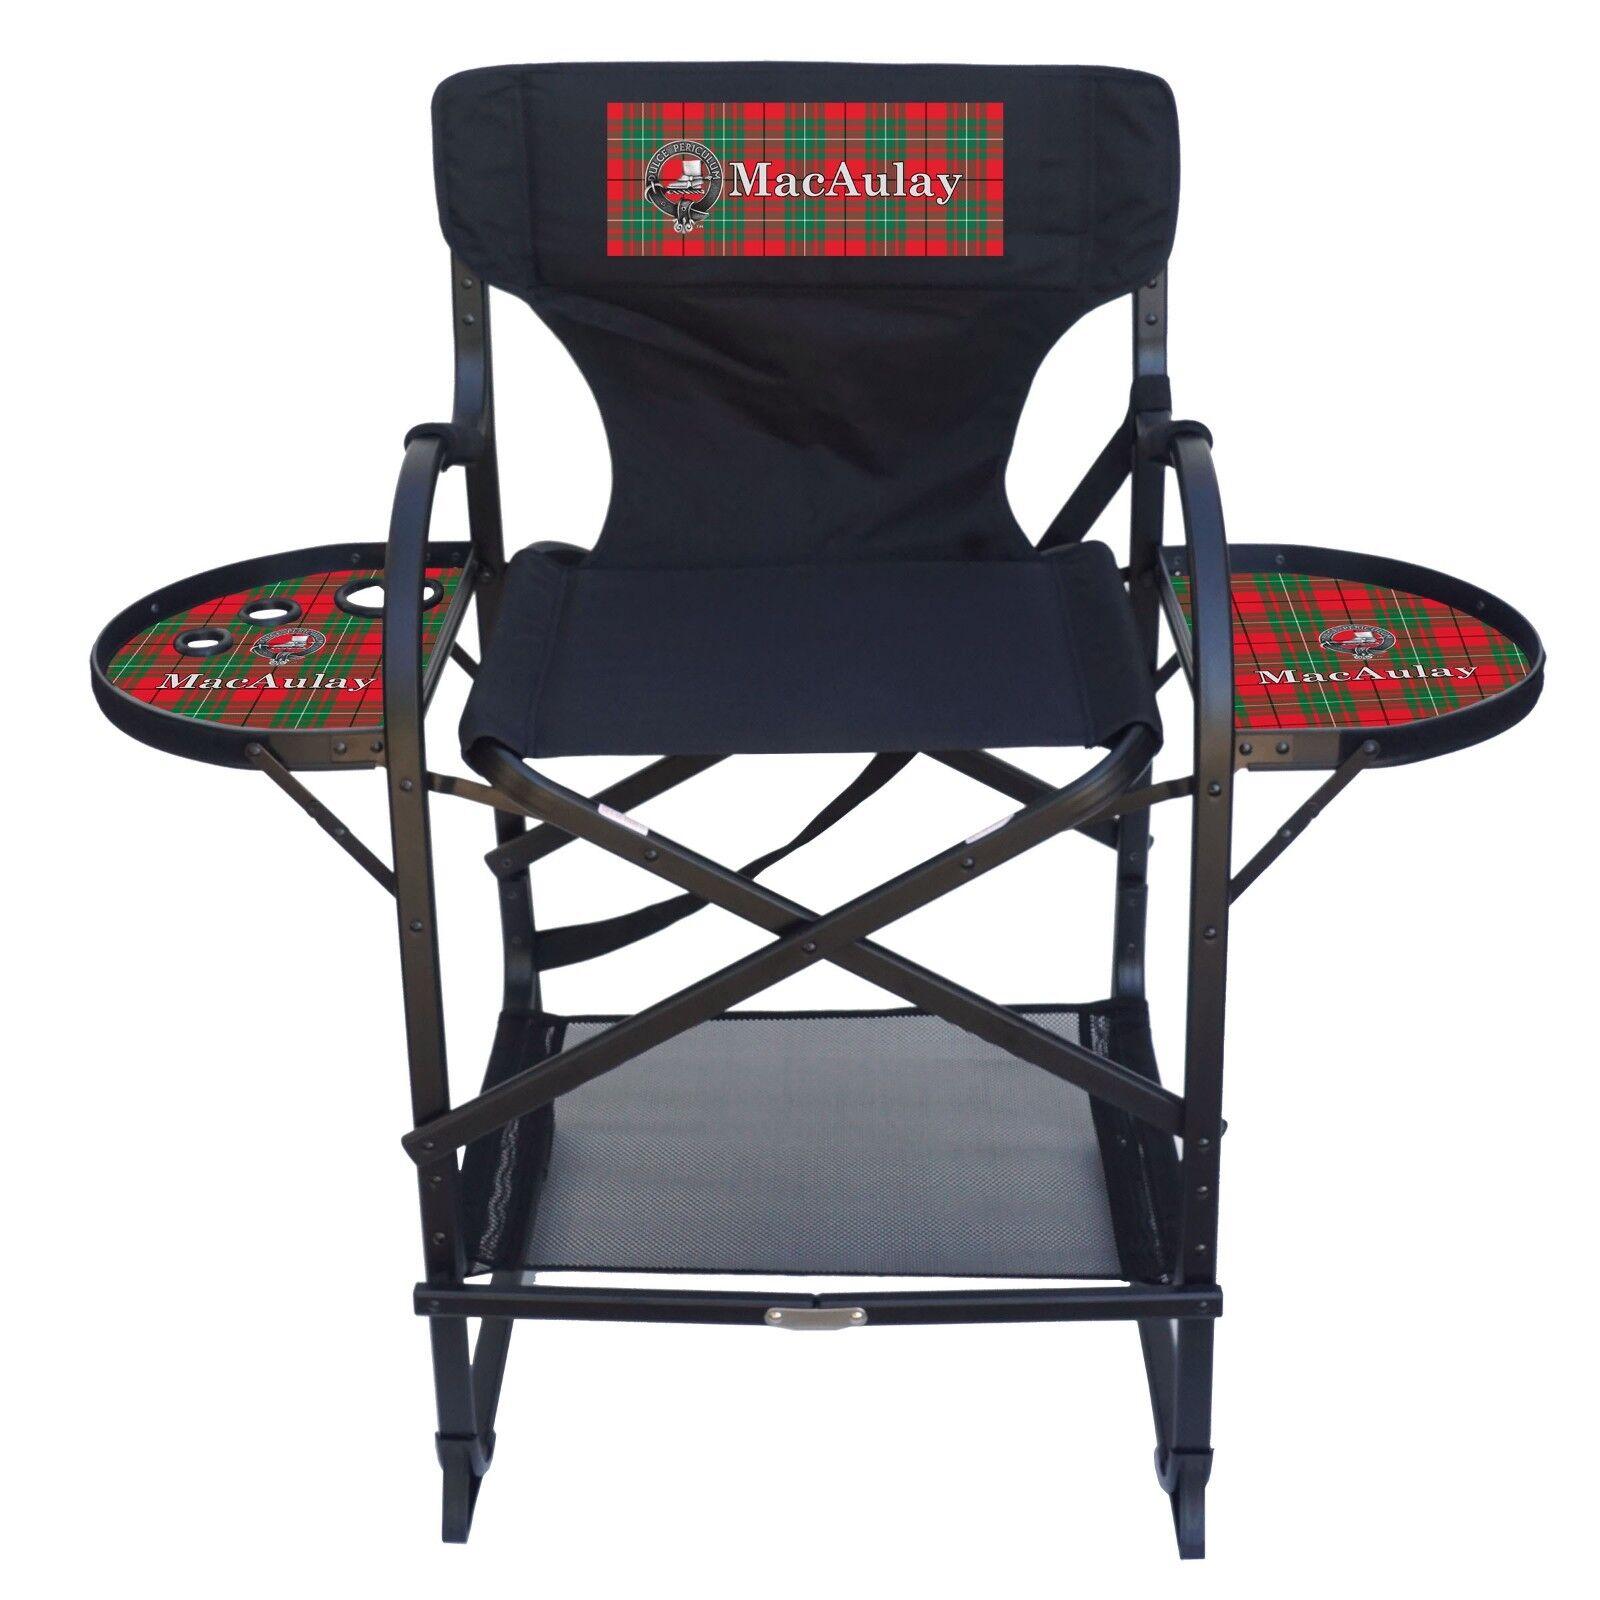 Clan MacAulay Imprinted Tall Counter Height HD Aluminum Frame Folding Chair